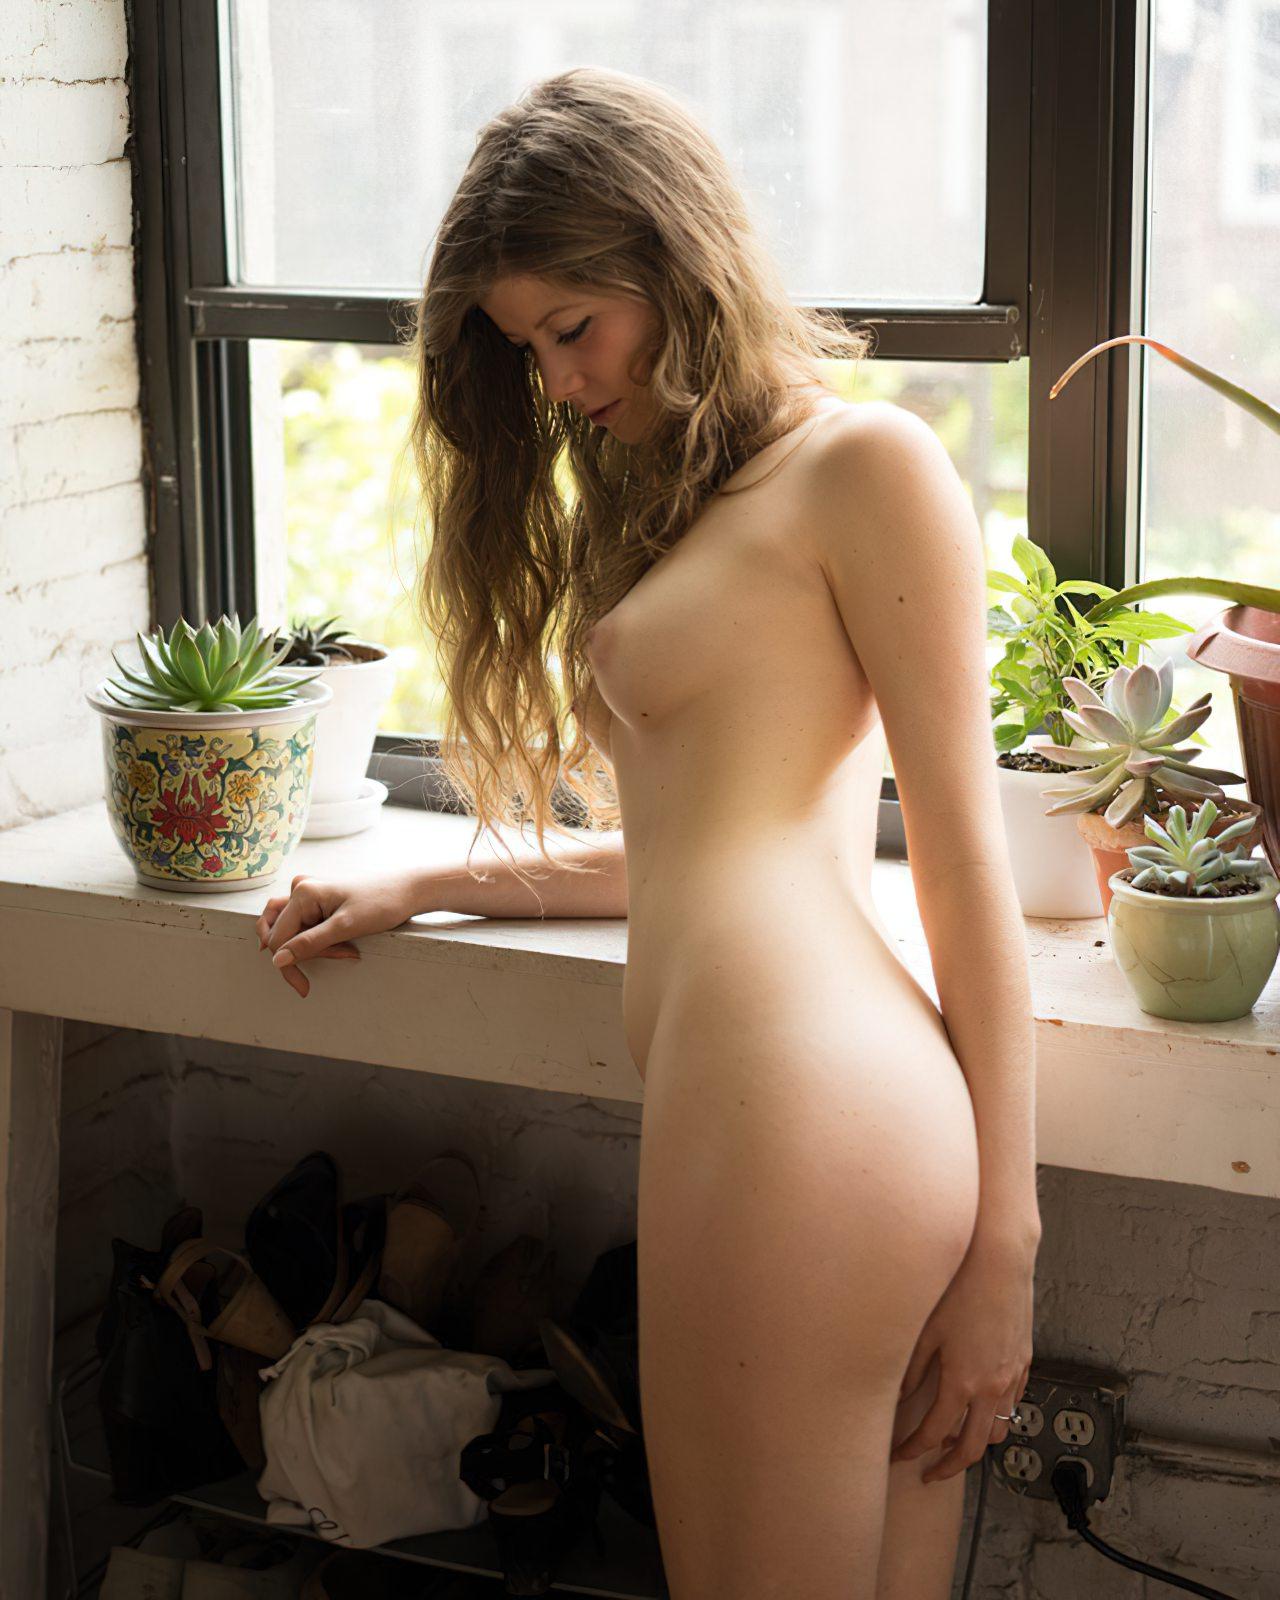 Fotos Mulheres Despidas (12)